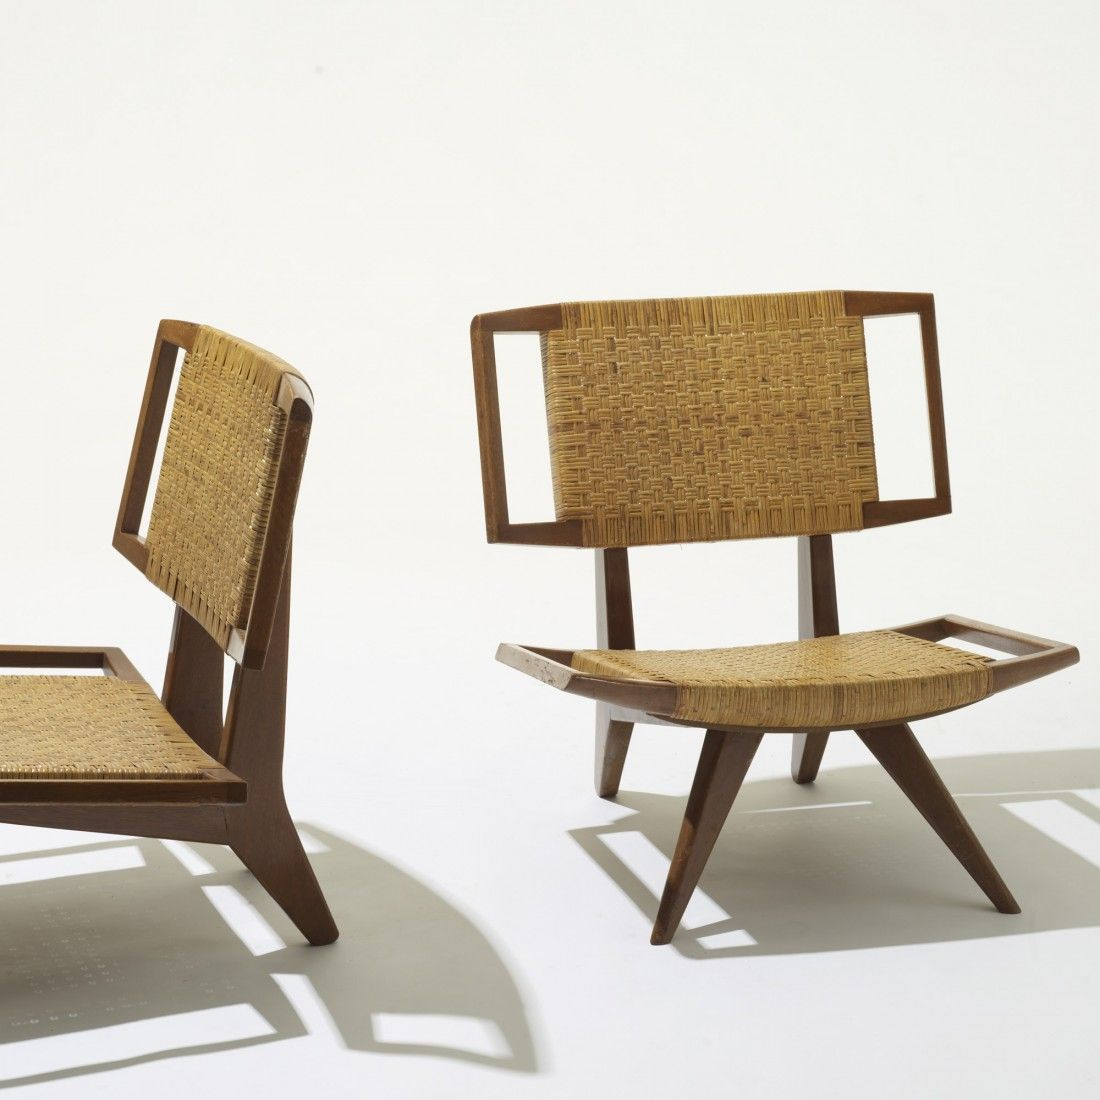 Modern savonarola chair - Paul Laszlo Lounge Chair For Glenn Of California 1950